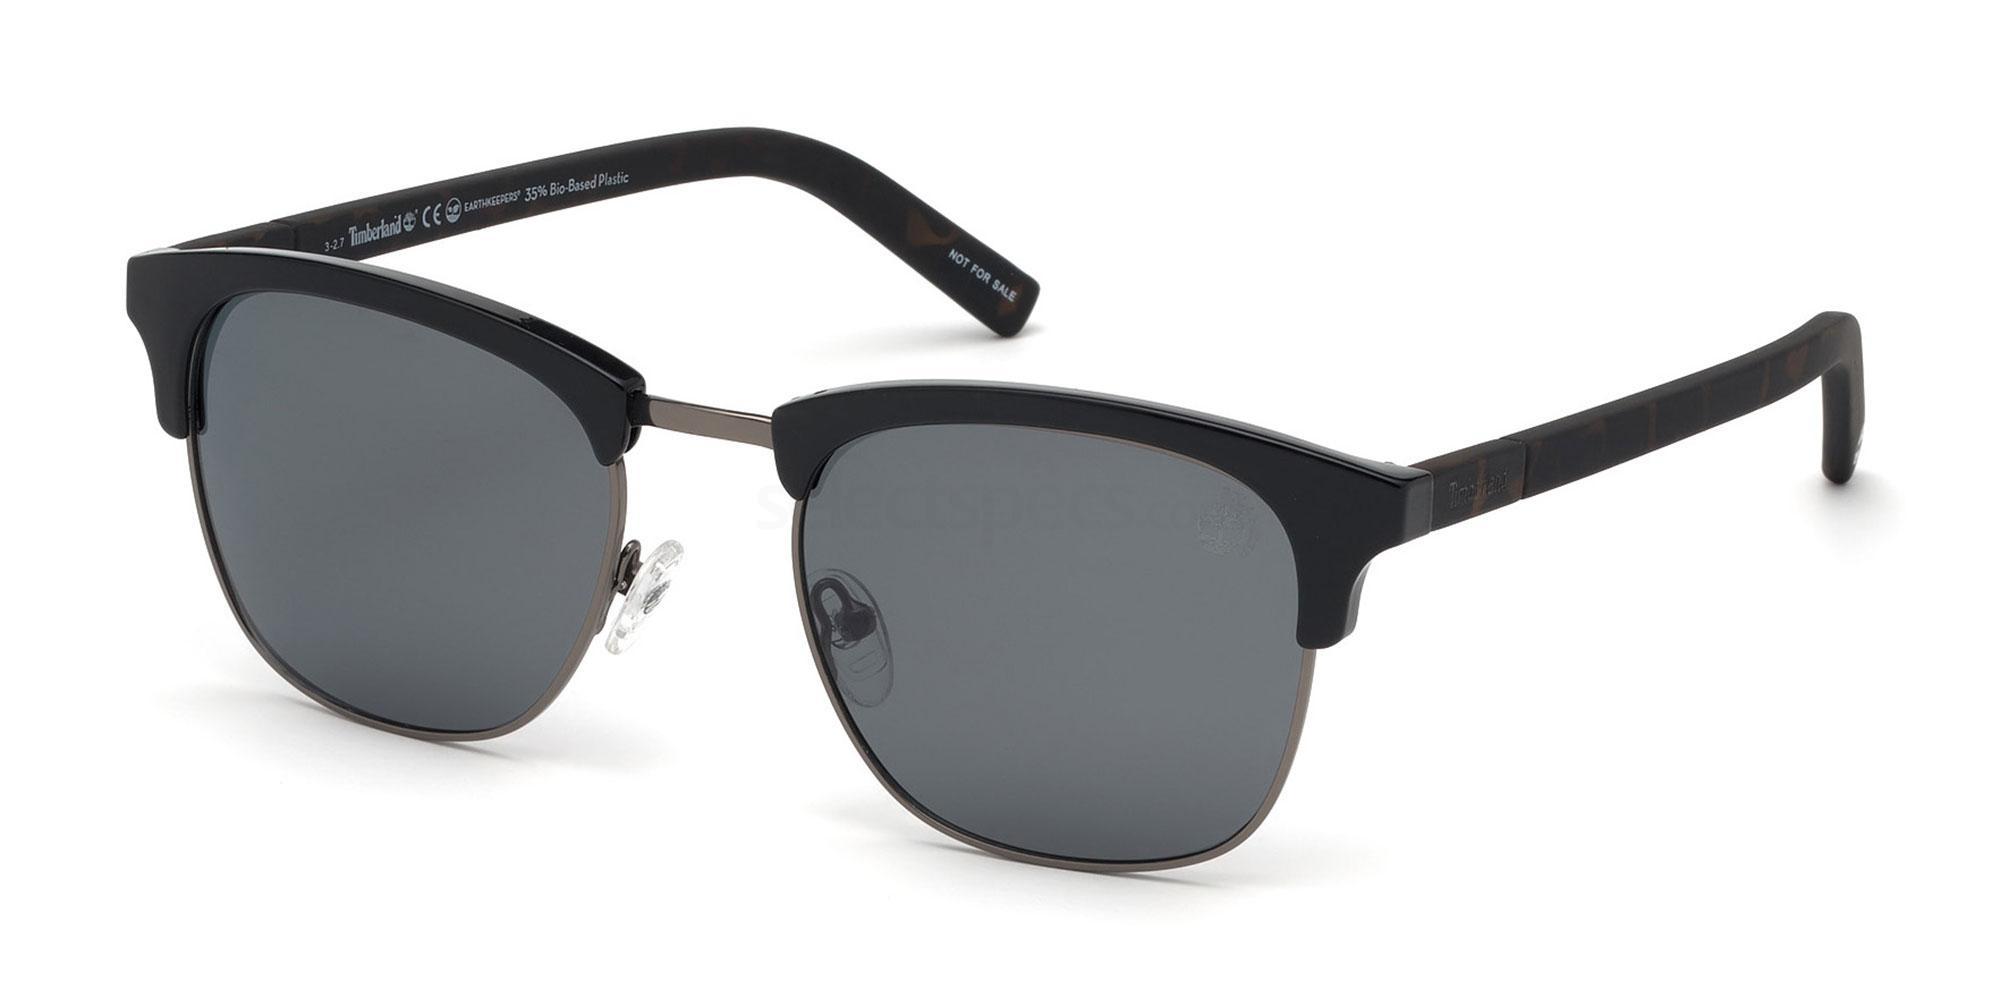 01D TB9148 Sunglasses, Timberland